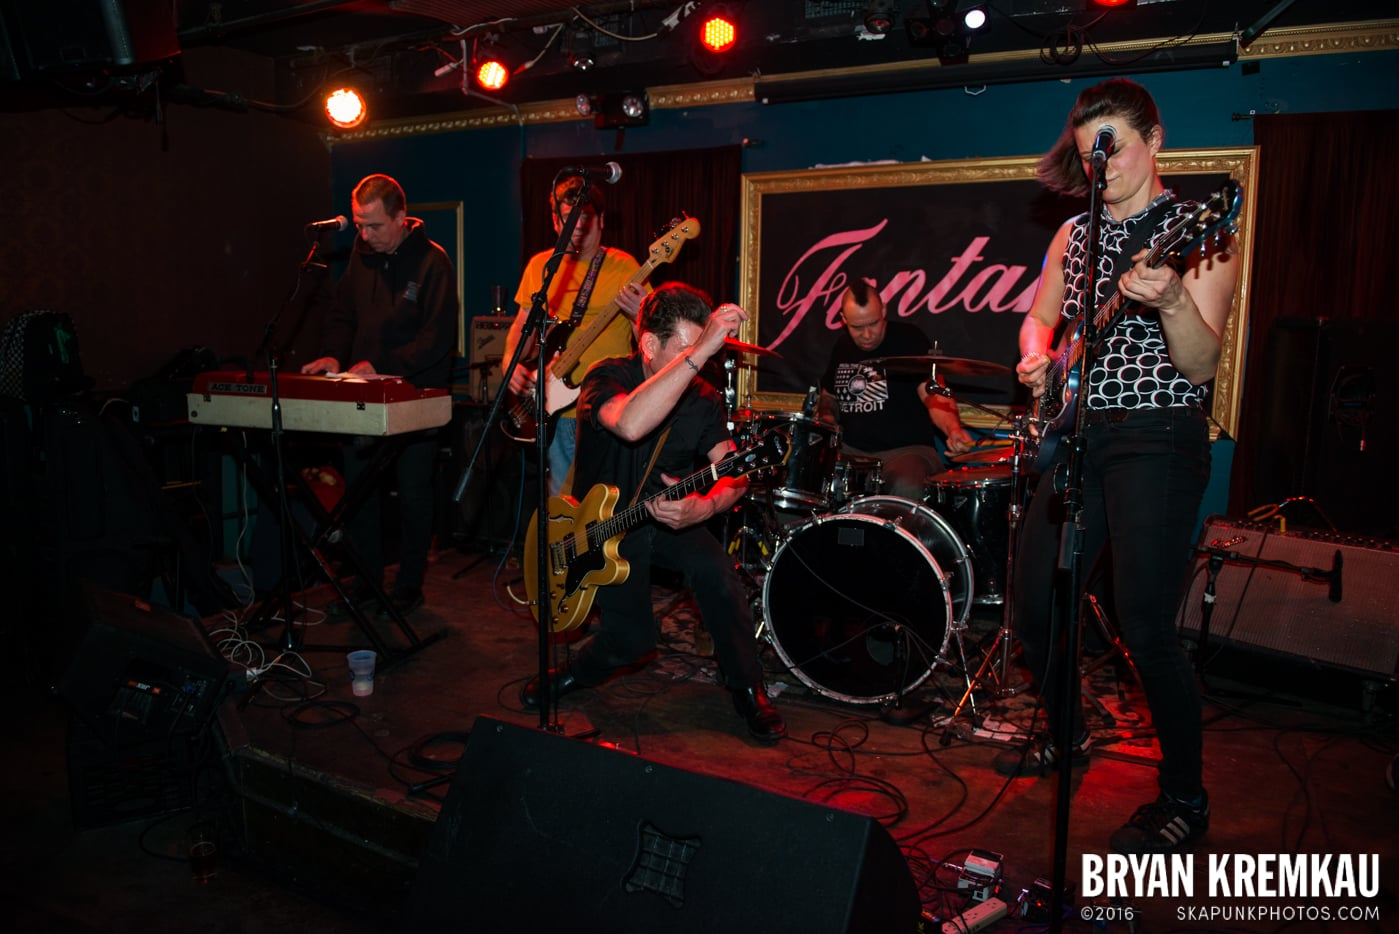 Roddy Radiation & The Scotch Bonnets @ Fontana's, NYC - 4.25.15 (9)